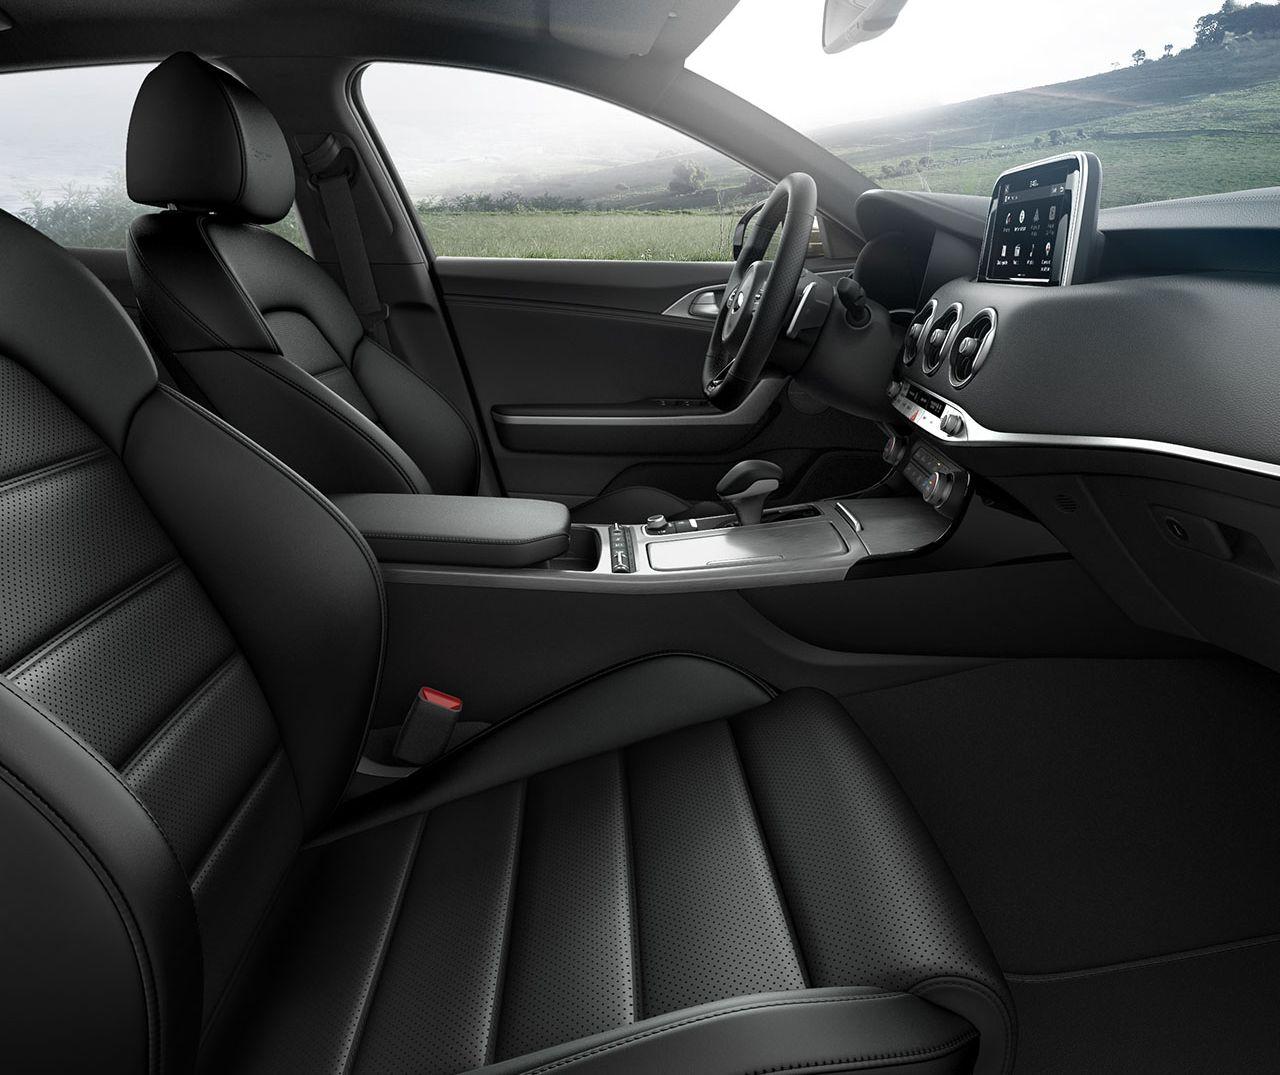 Luxury Inside in the Kia Stinger